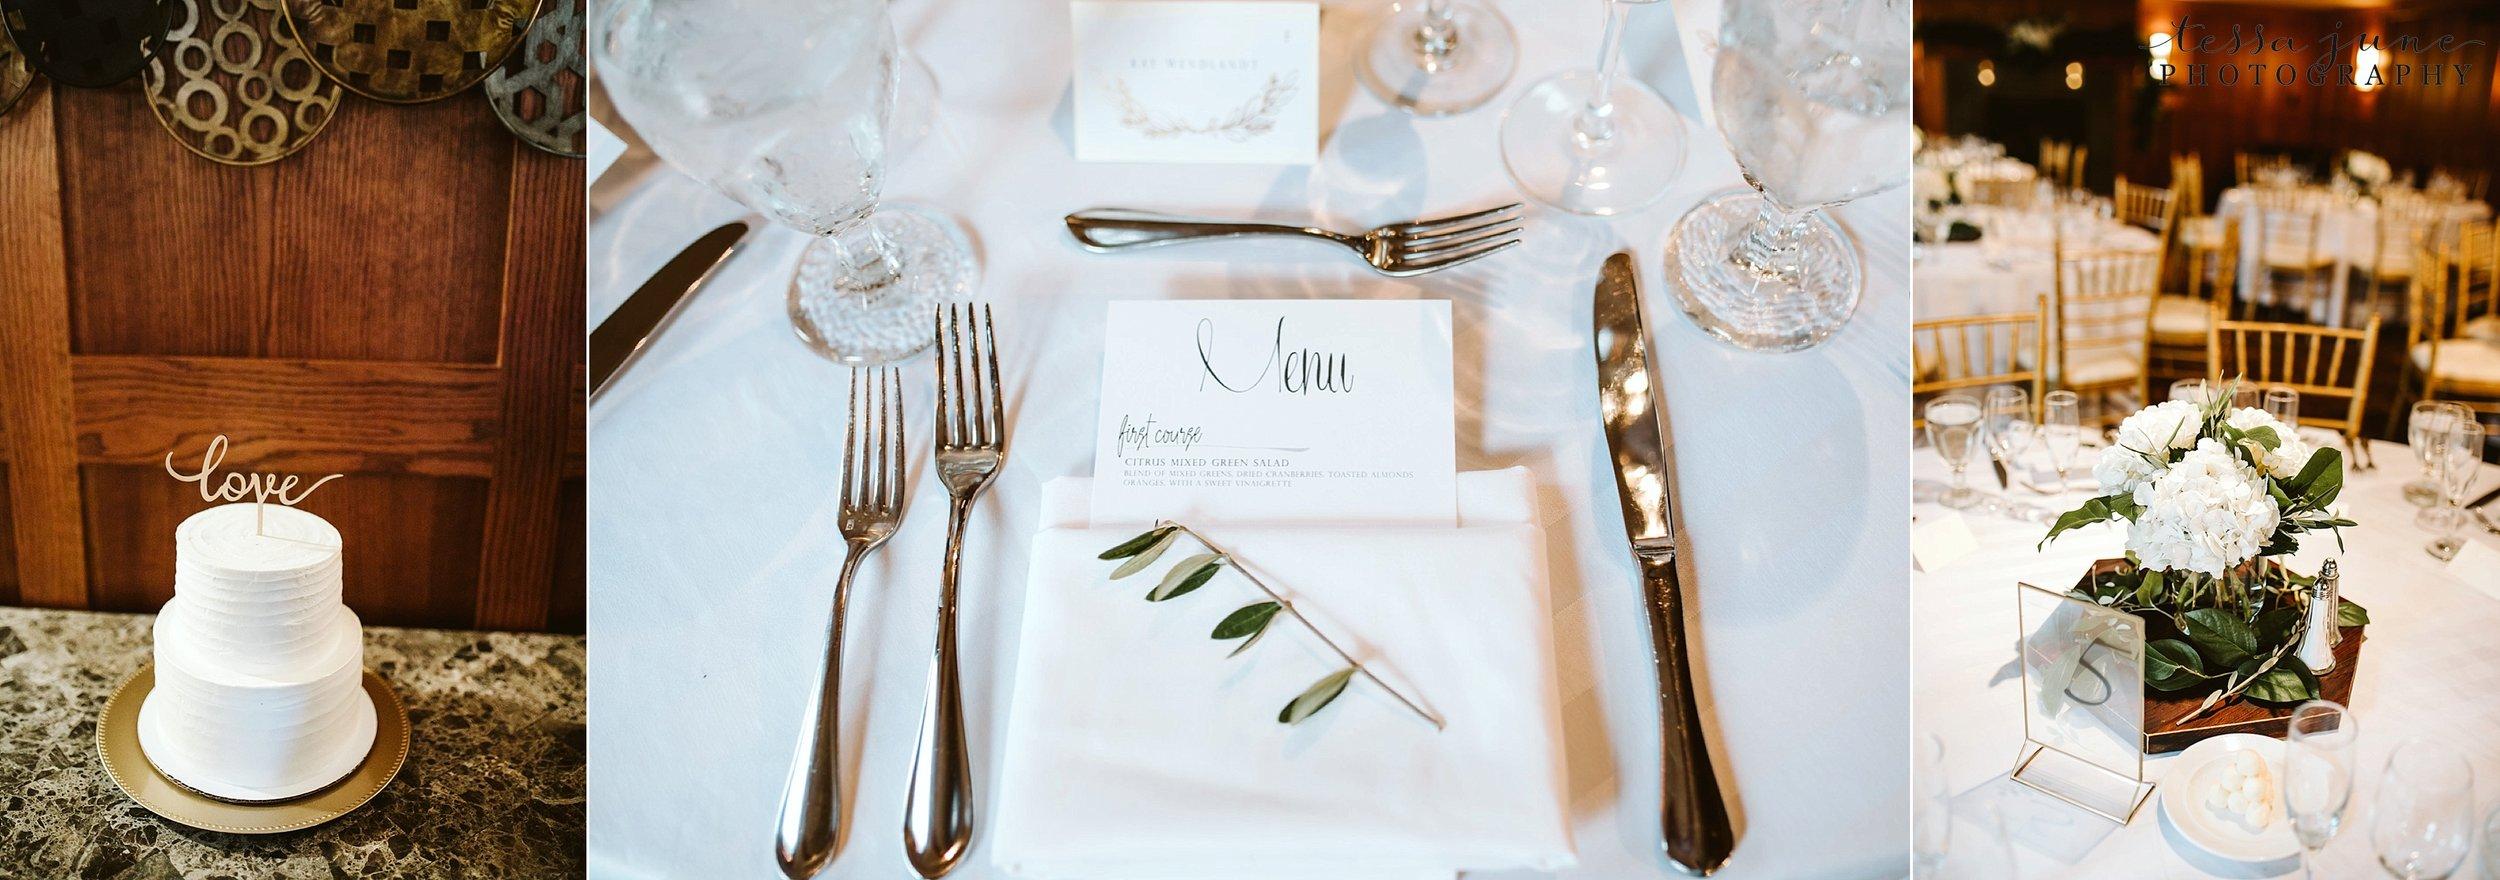 grandview-lodge-wedding-nisswa-minnesota-reception